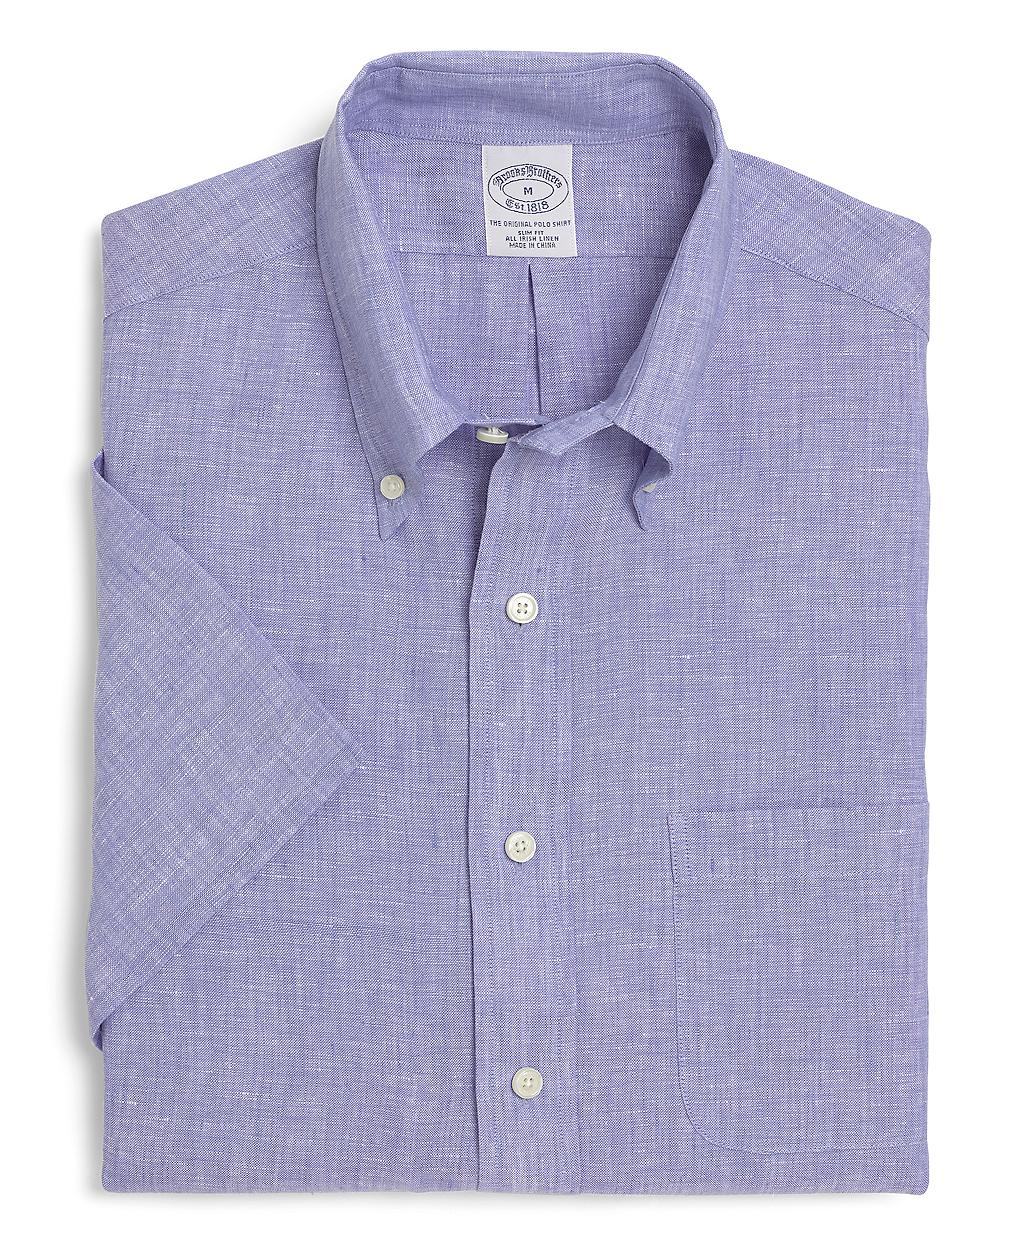 Brooks brothers slim fit irish linen short sleeve sport for Irish linen dress shirts